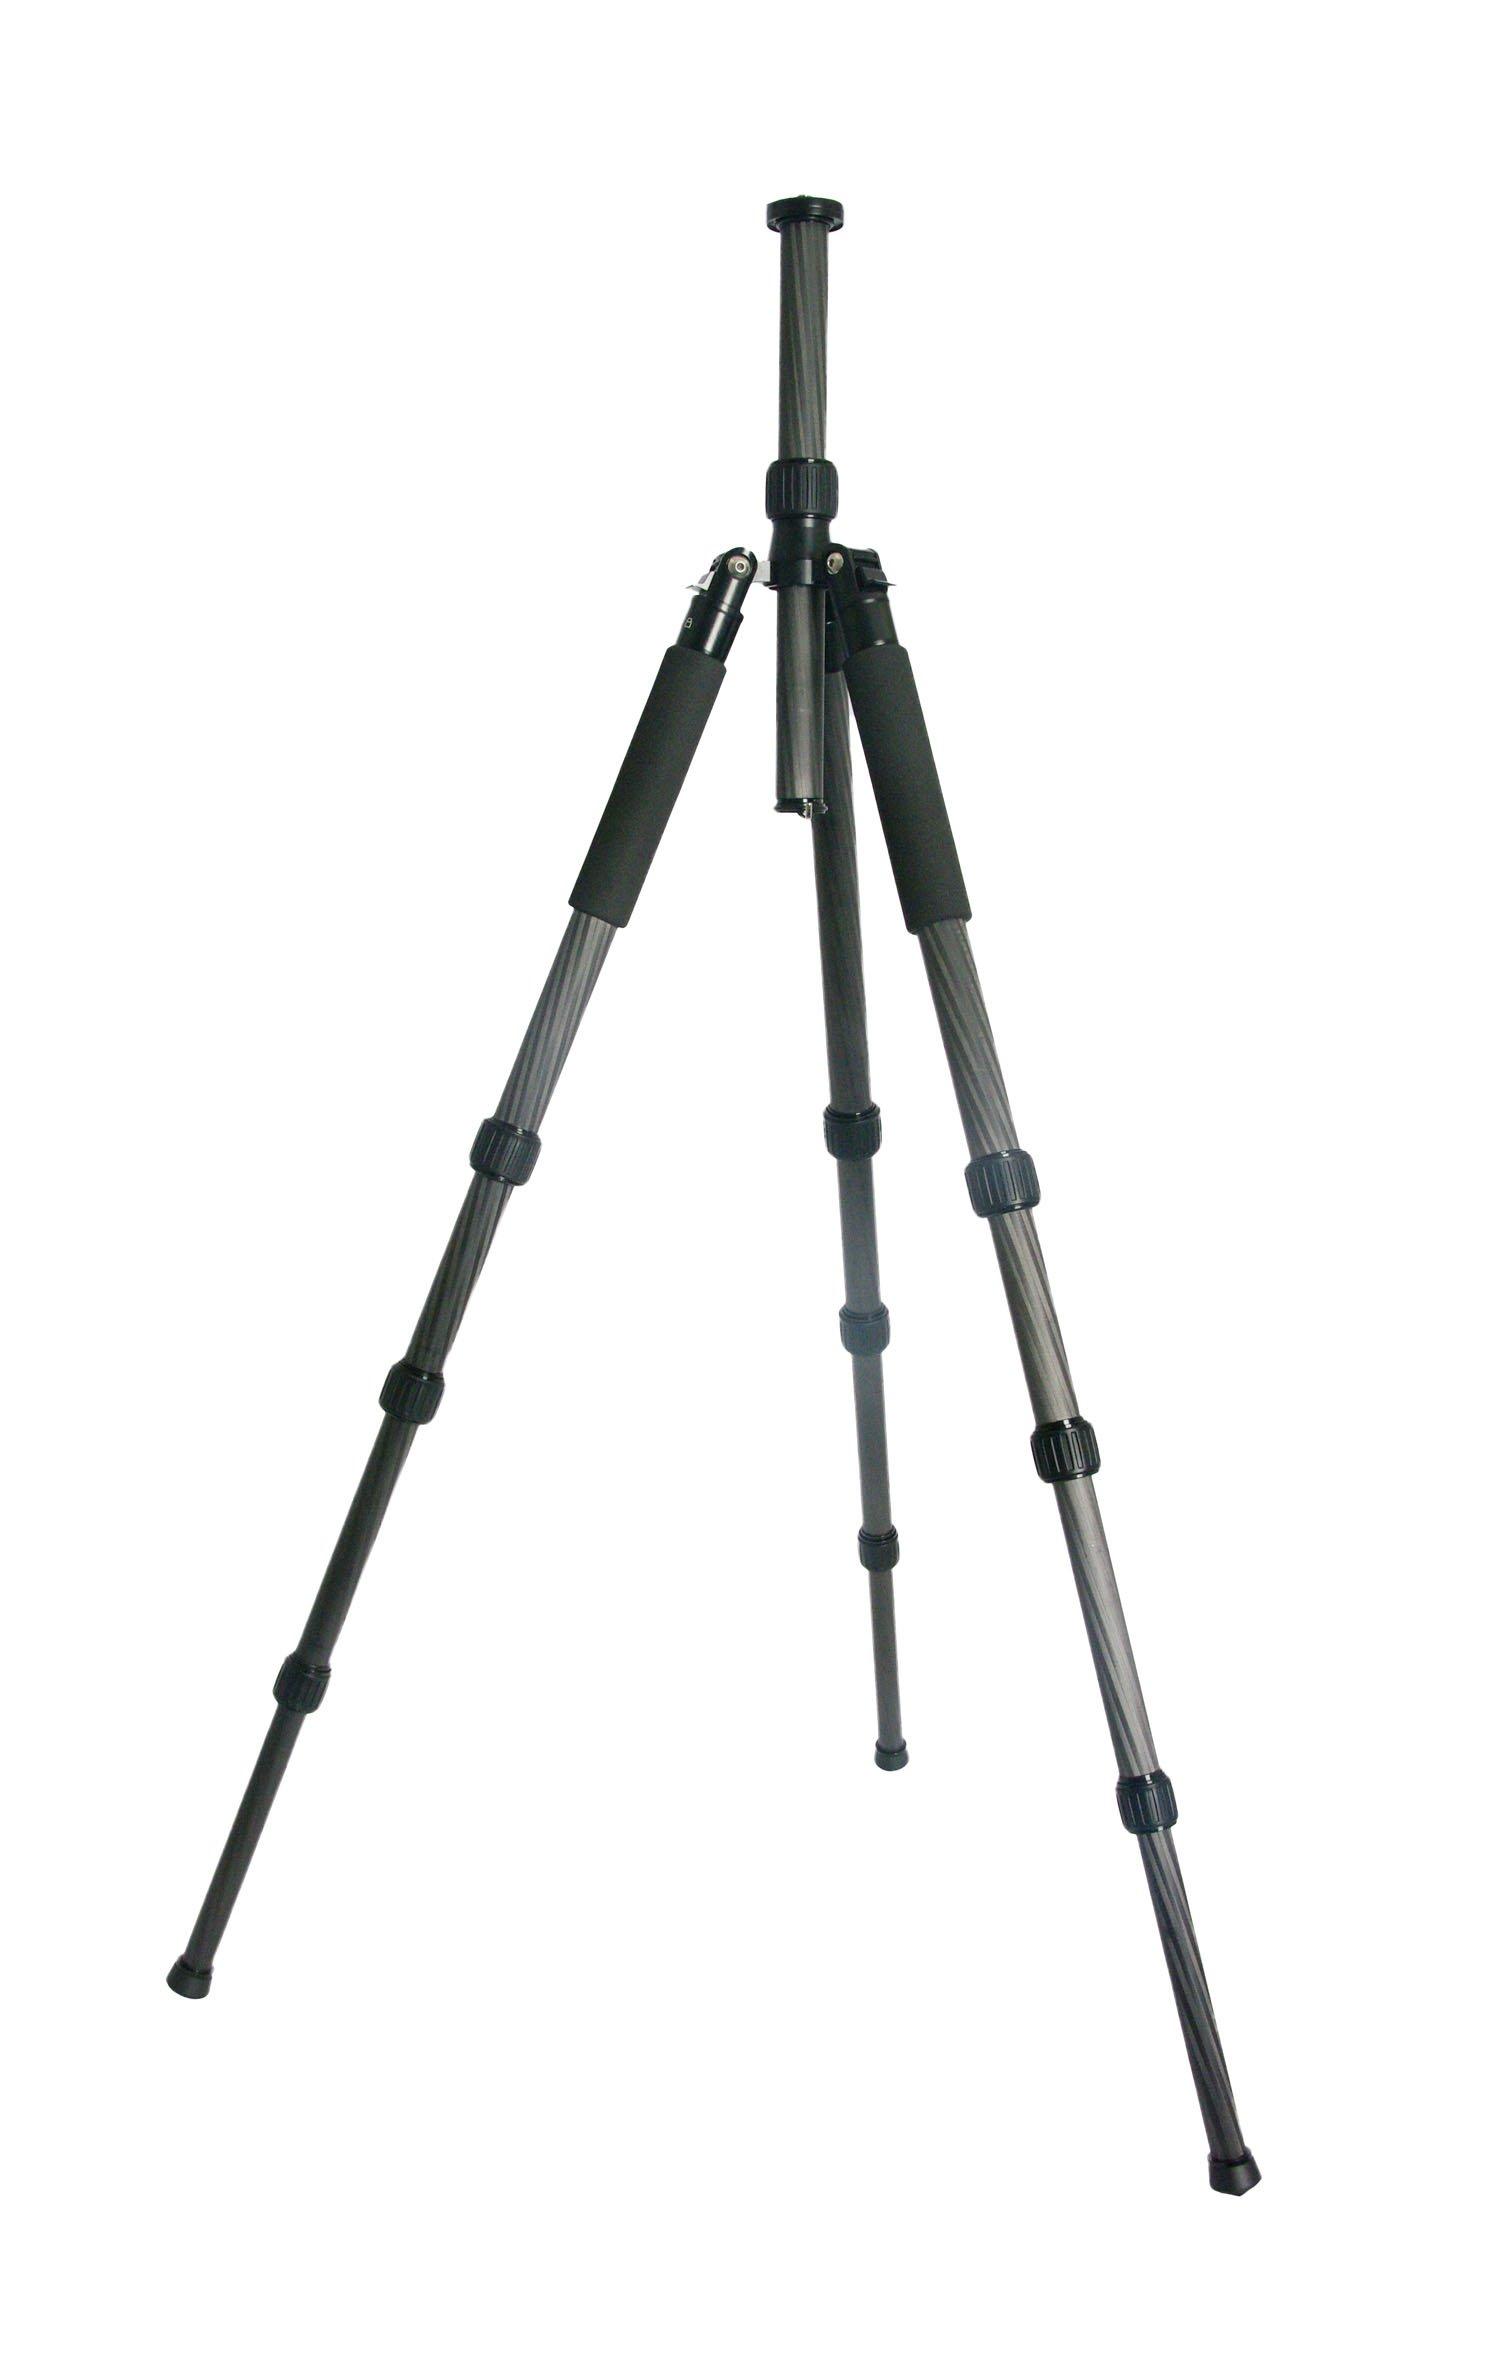 TERRA FIRMA TRIPODS T-CF450 Carbon Fiber 4 Section Tripod Leg Set, Black by TERRA FIRMA TRIPODS (Image #15)